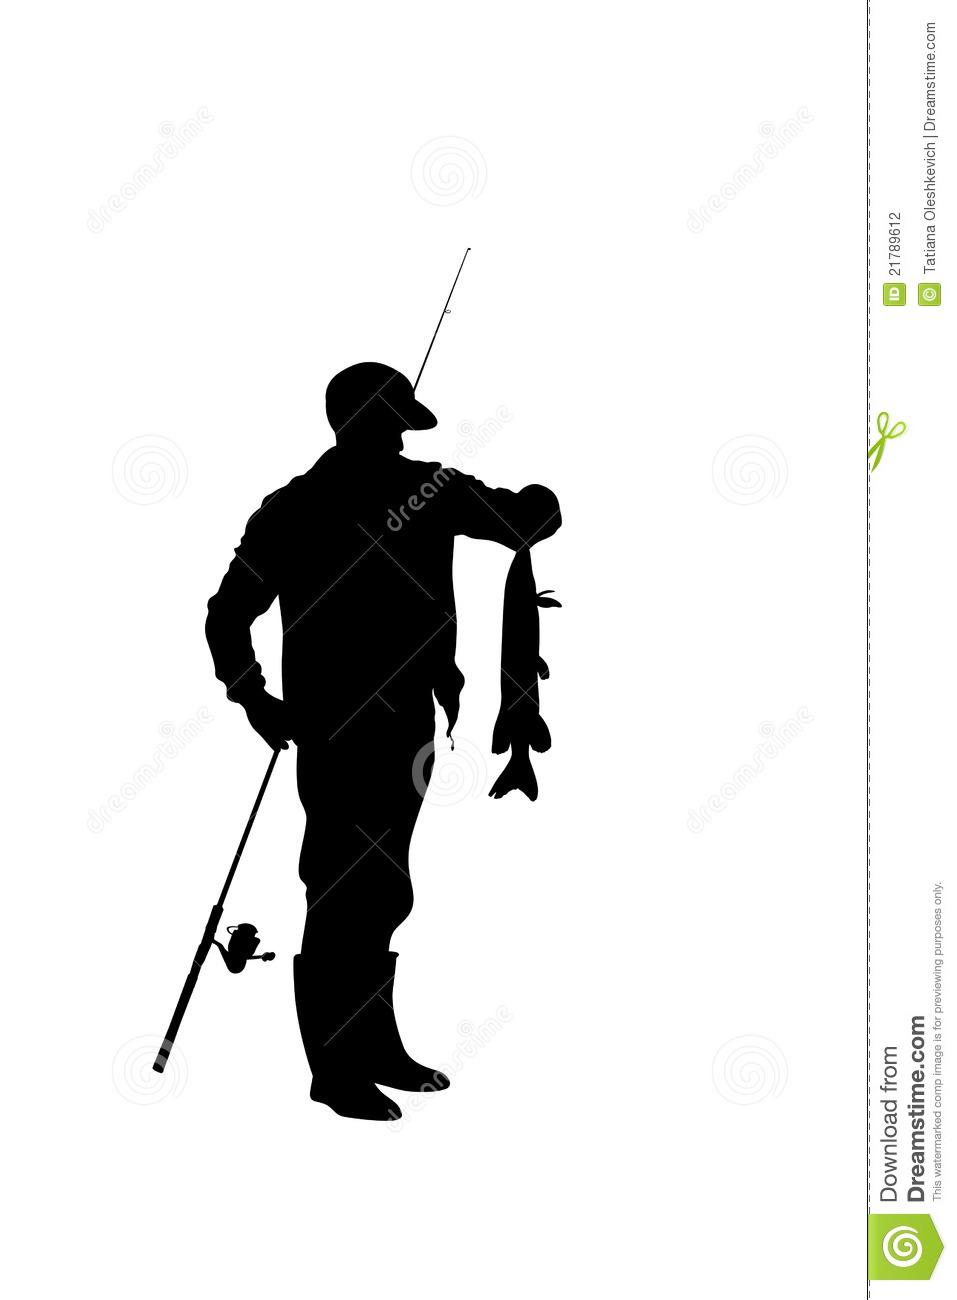 957x1300 Fishing Silhouette